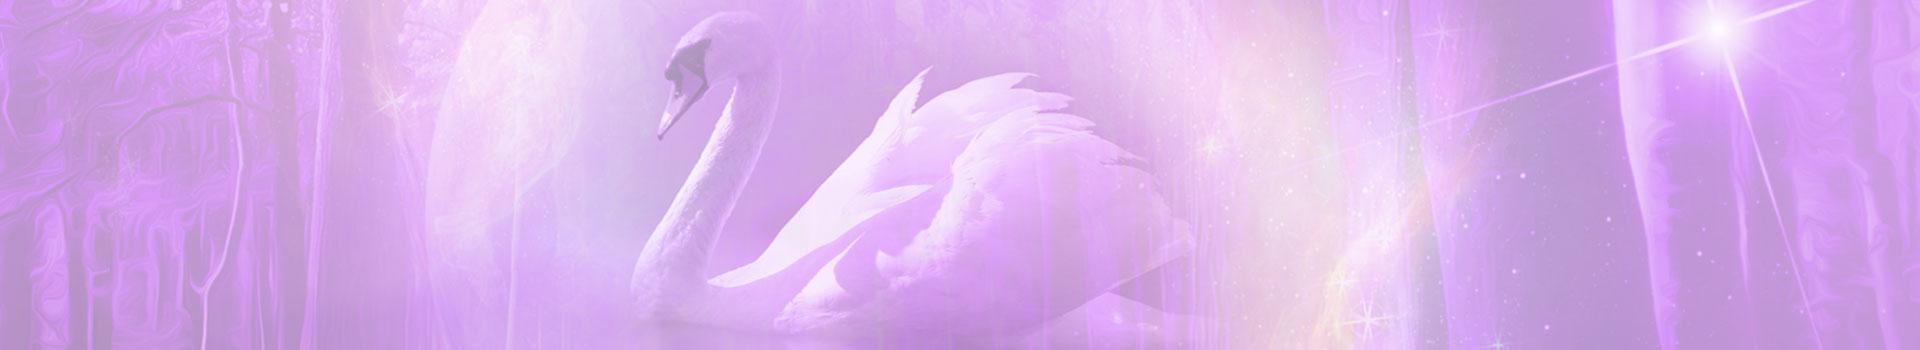 swan-centered-banner-1920x350